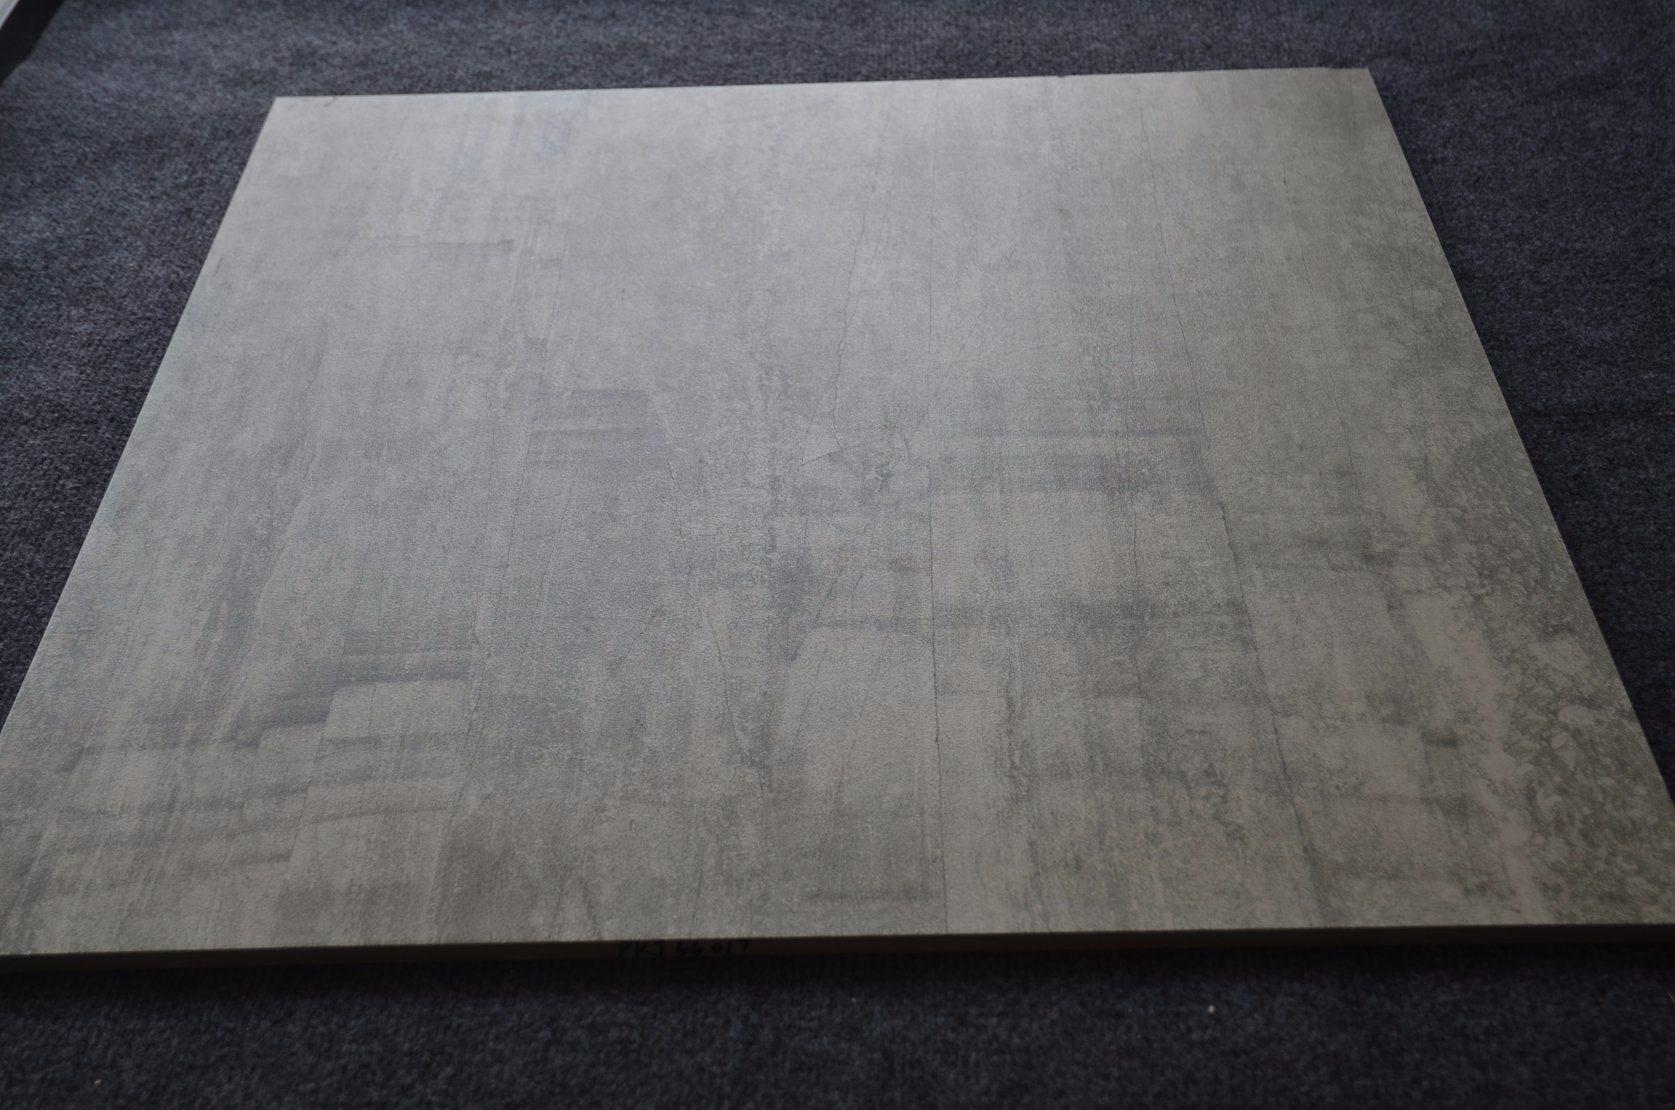 China Super Quality Cheap Ceramic Floor Tile Rustic Non Slip Tile